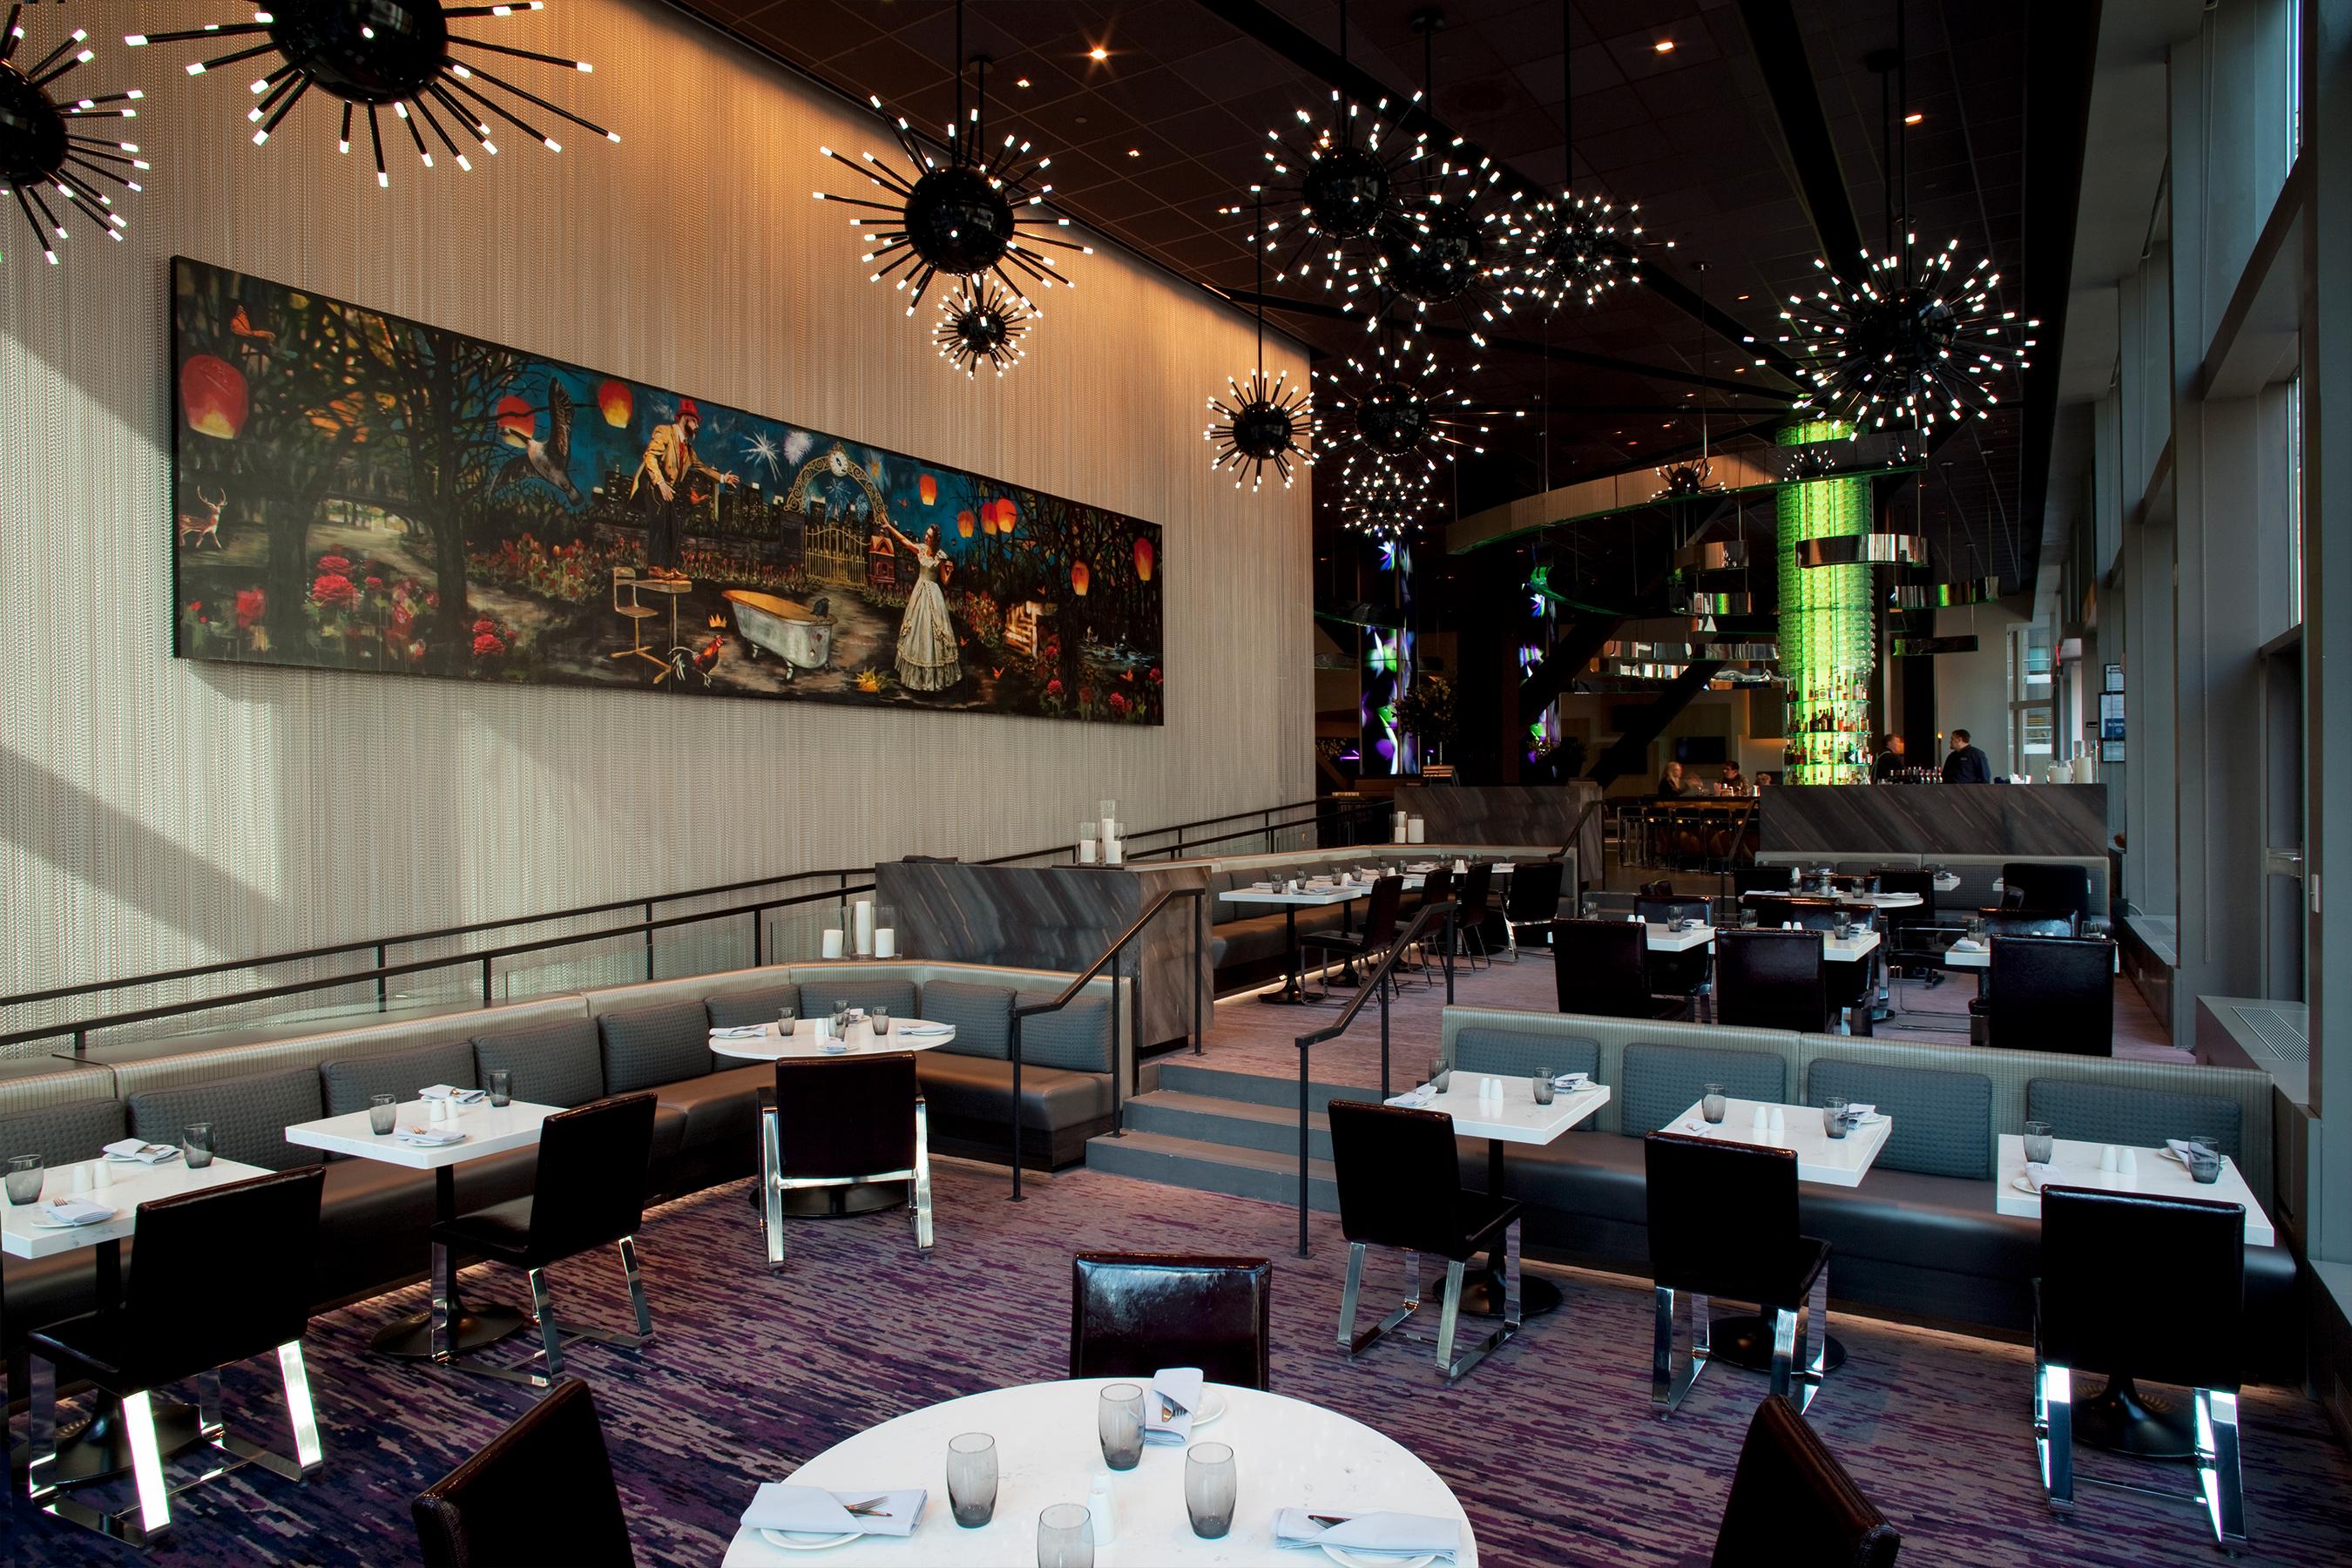 Café Nicole Novotel Resturant Interior